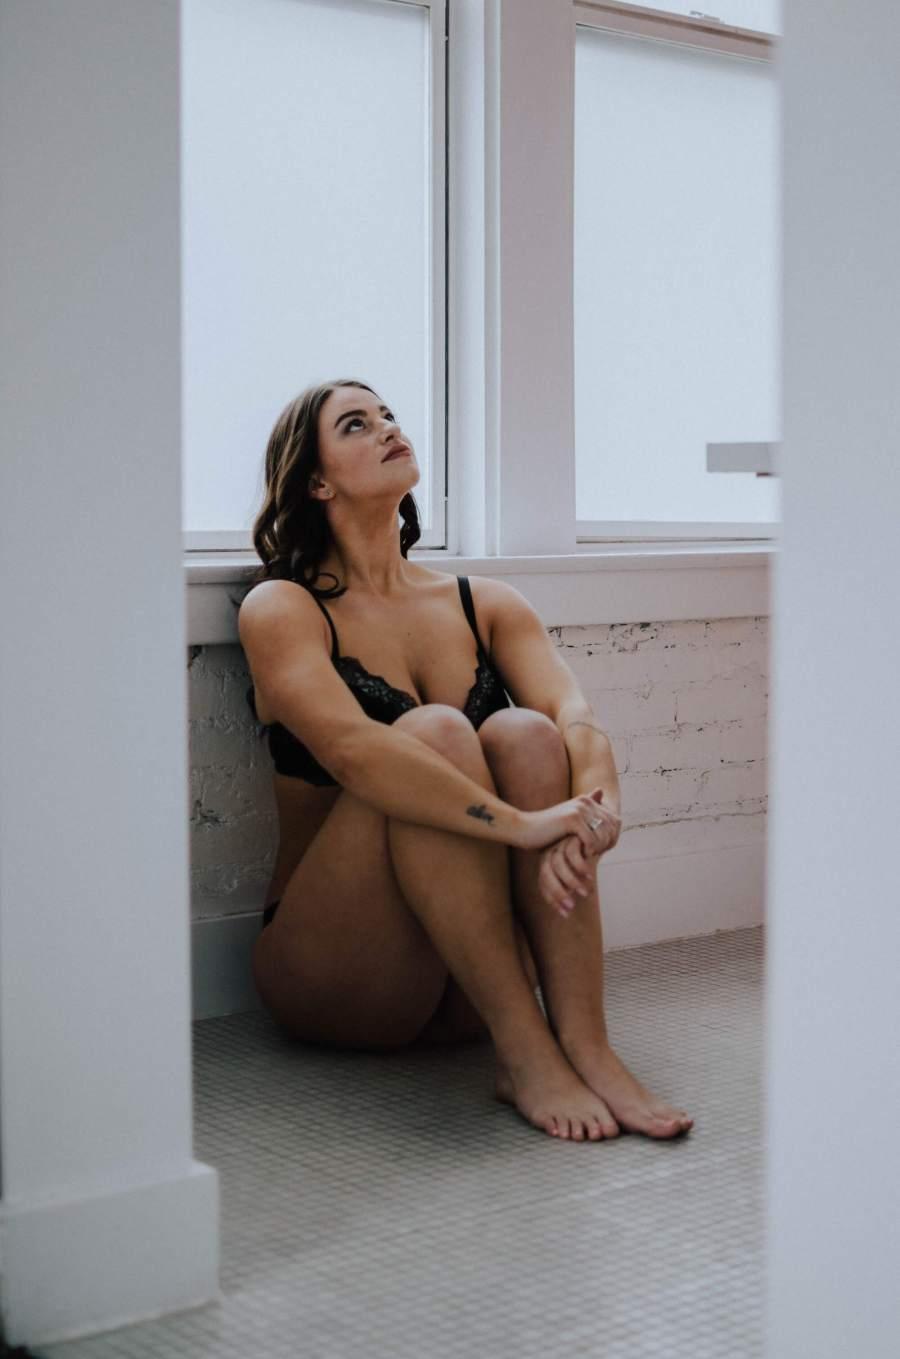 seattle-ace-hotel, ace-hotel, ace-hotel-boudoir, seattle-boudoir-photographer, seattle-boudoir, boudoir-photos, female-empowerment,